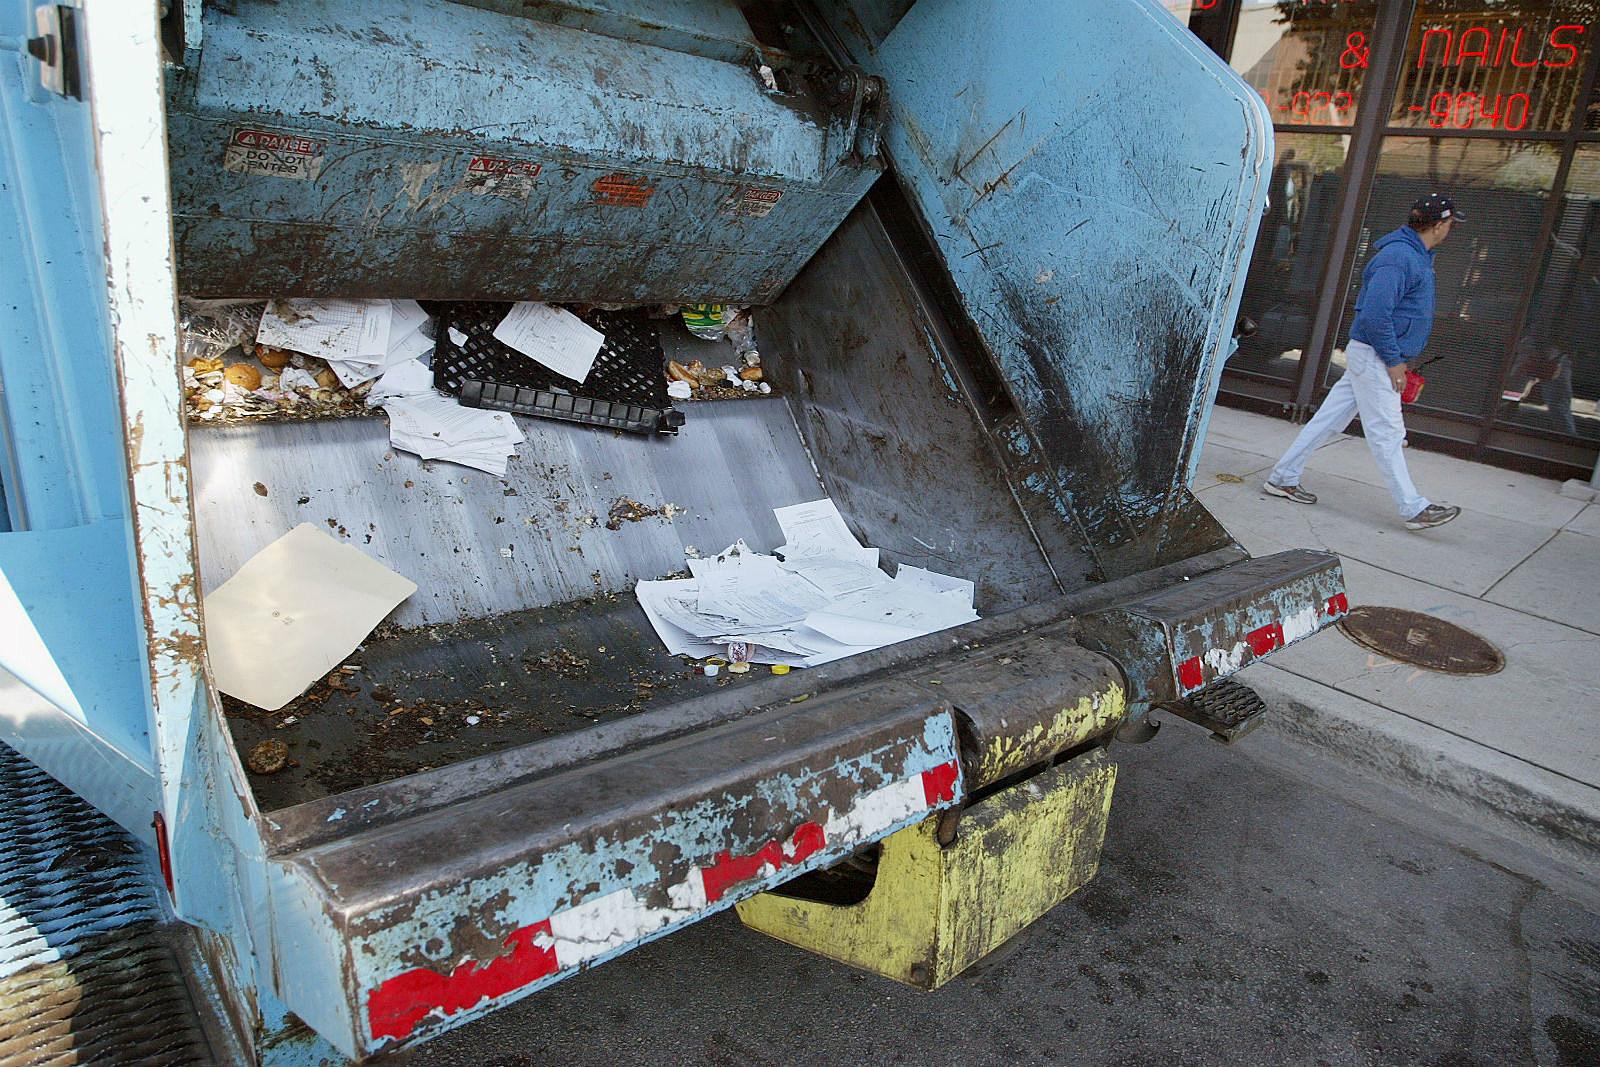 Garbage_Tim Boyle/Getty